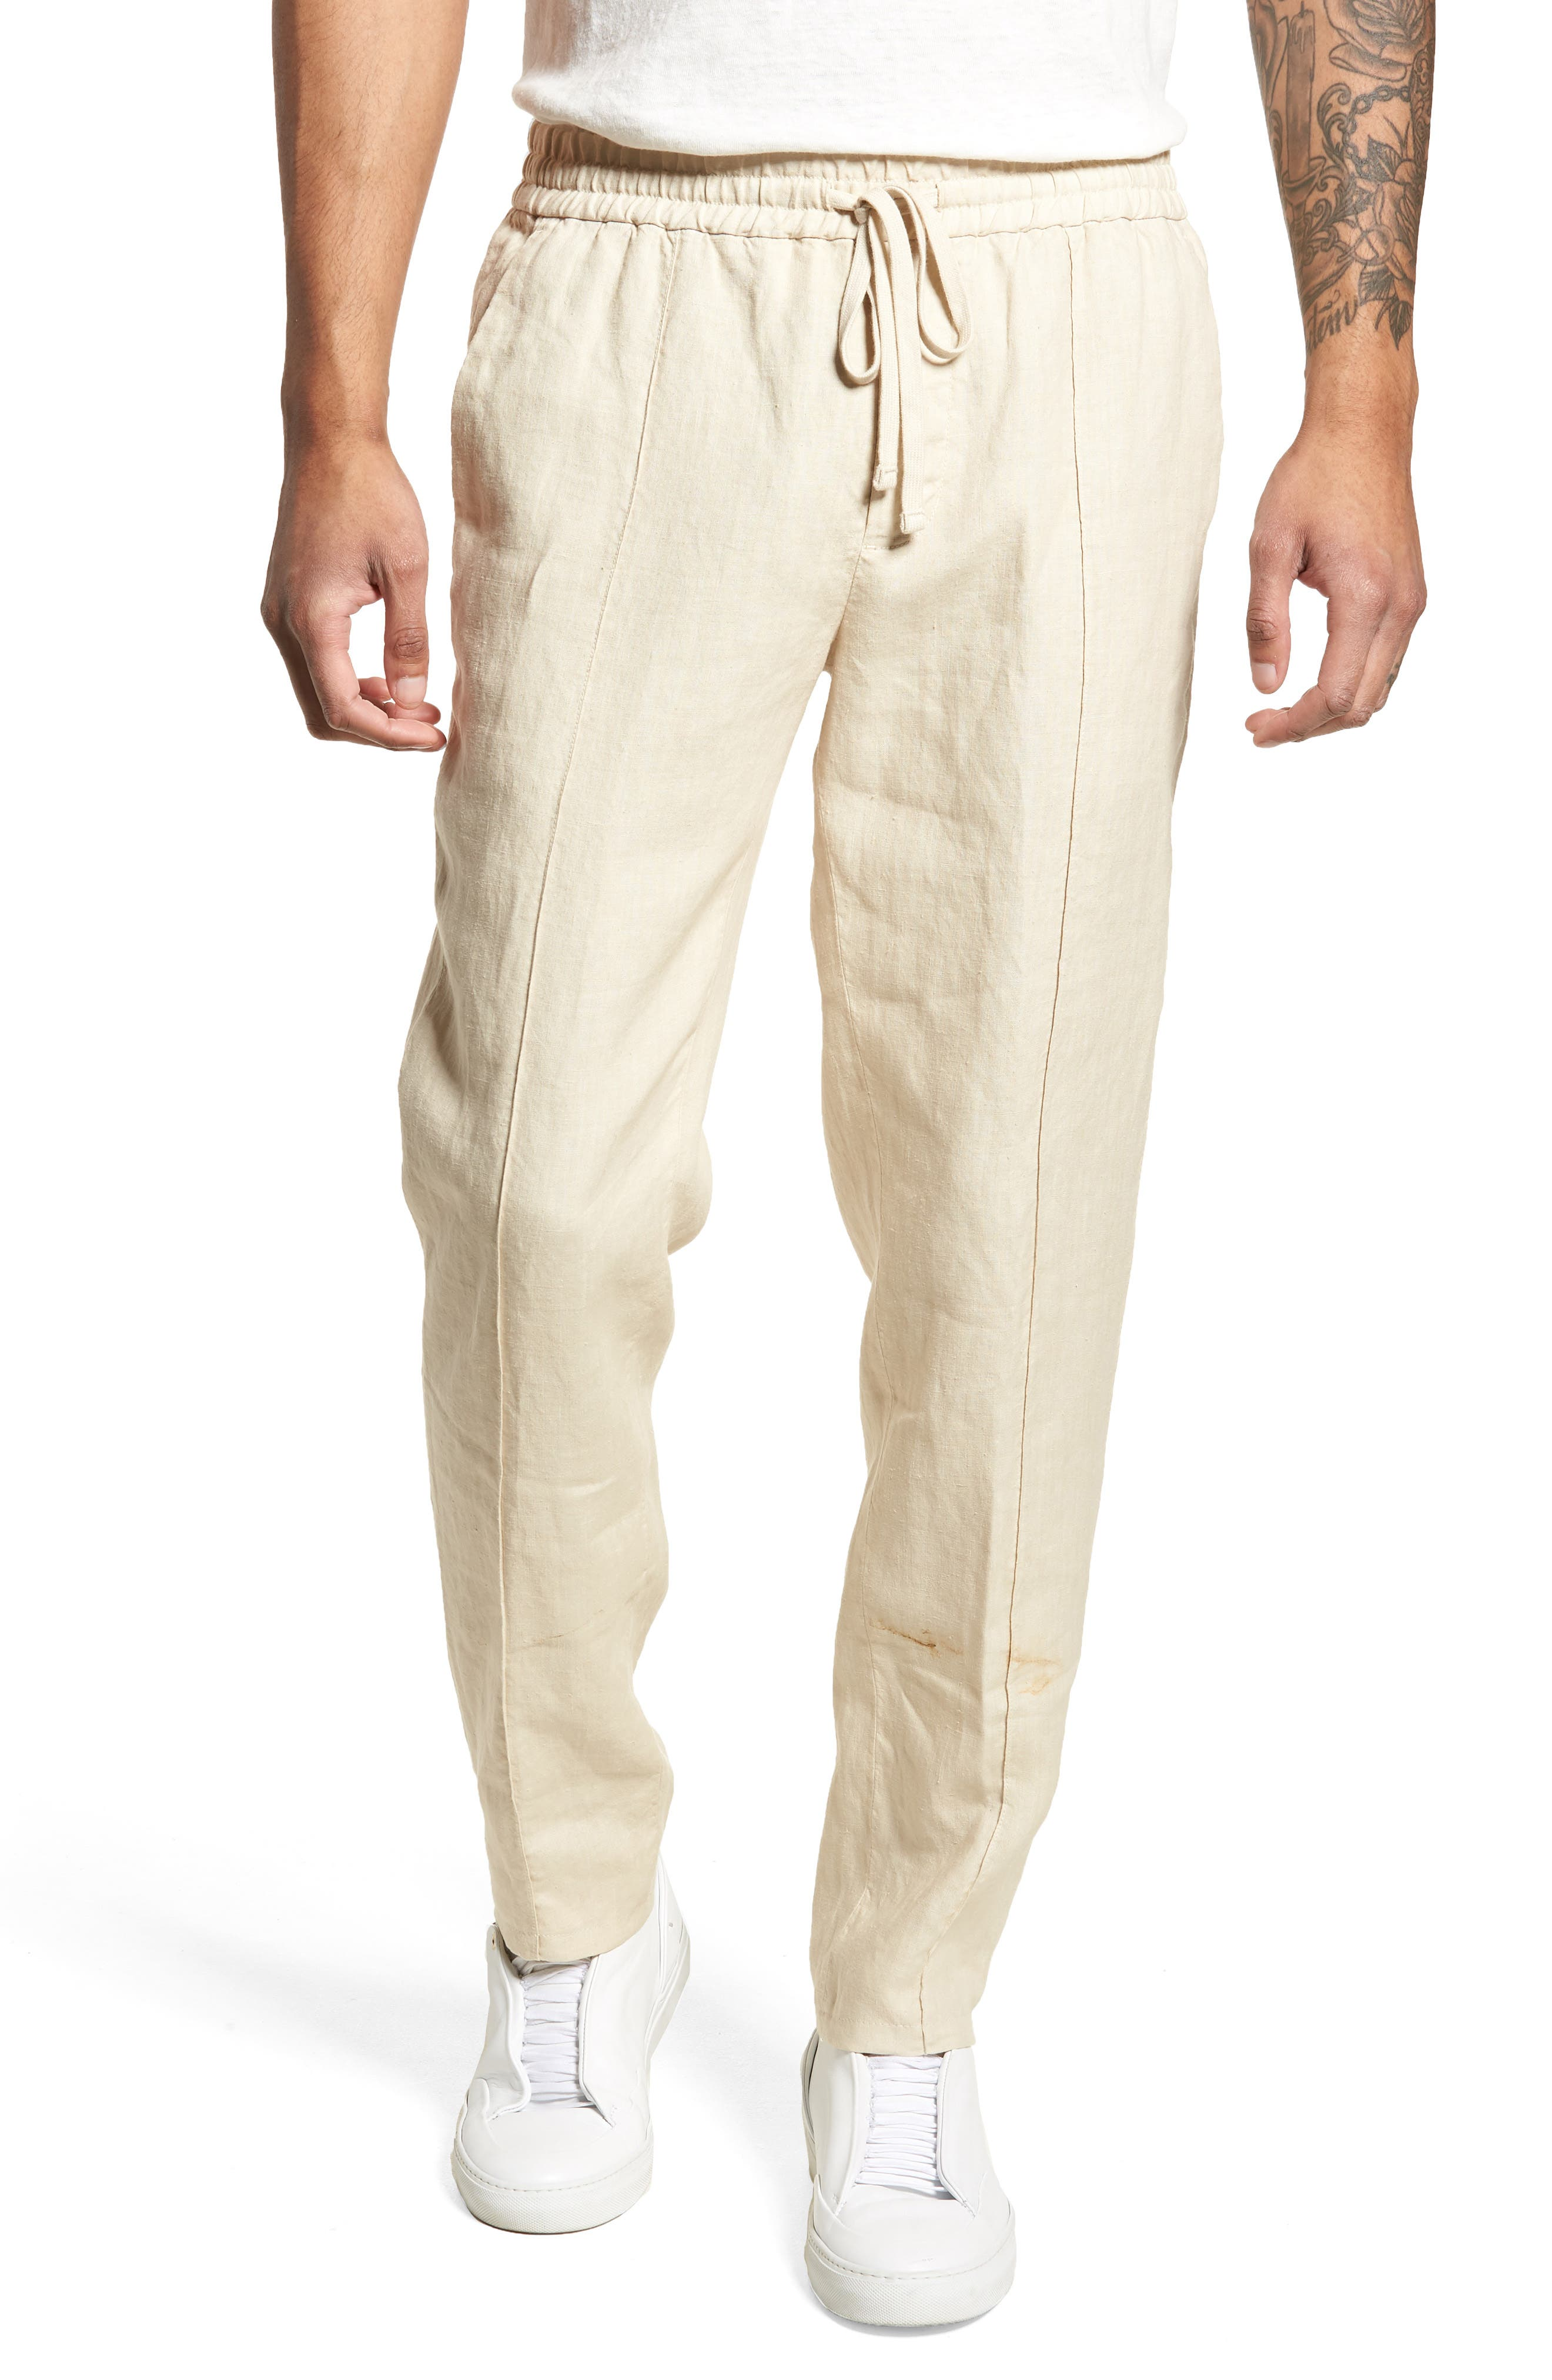 Pintuck Slim Fit Hemp Track Pants,                             Main thumbnail 1, color,                             WHITE SAND